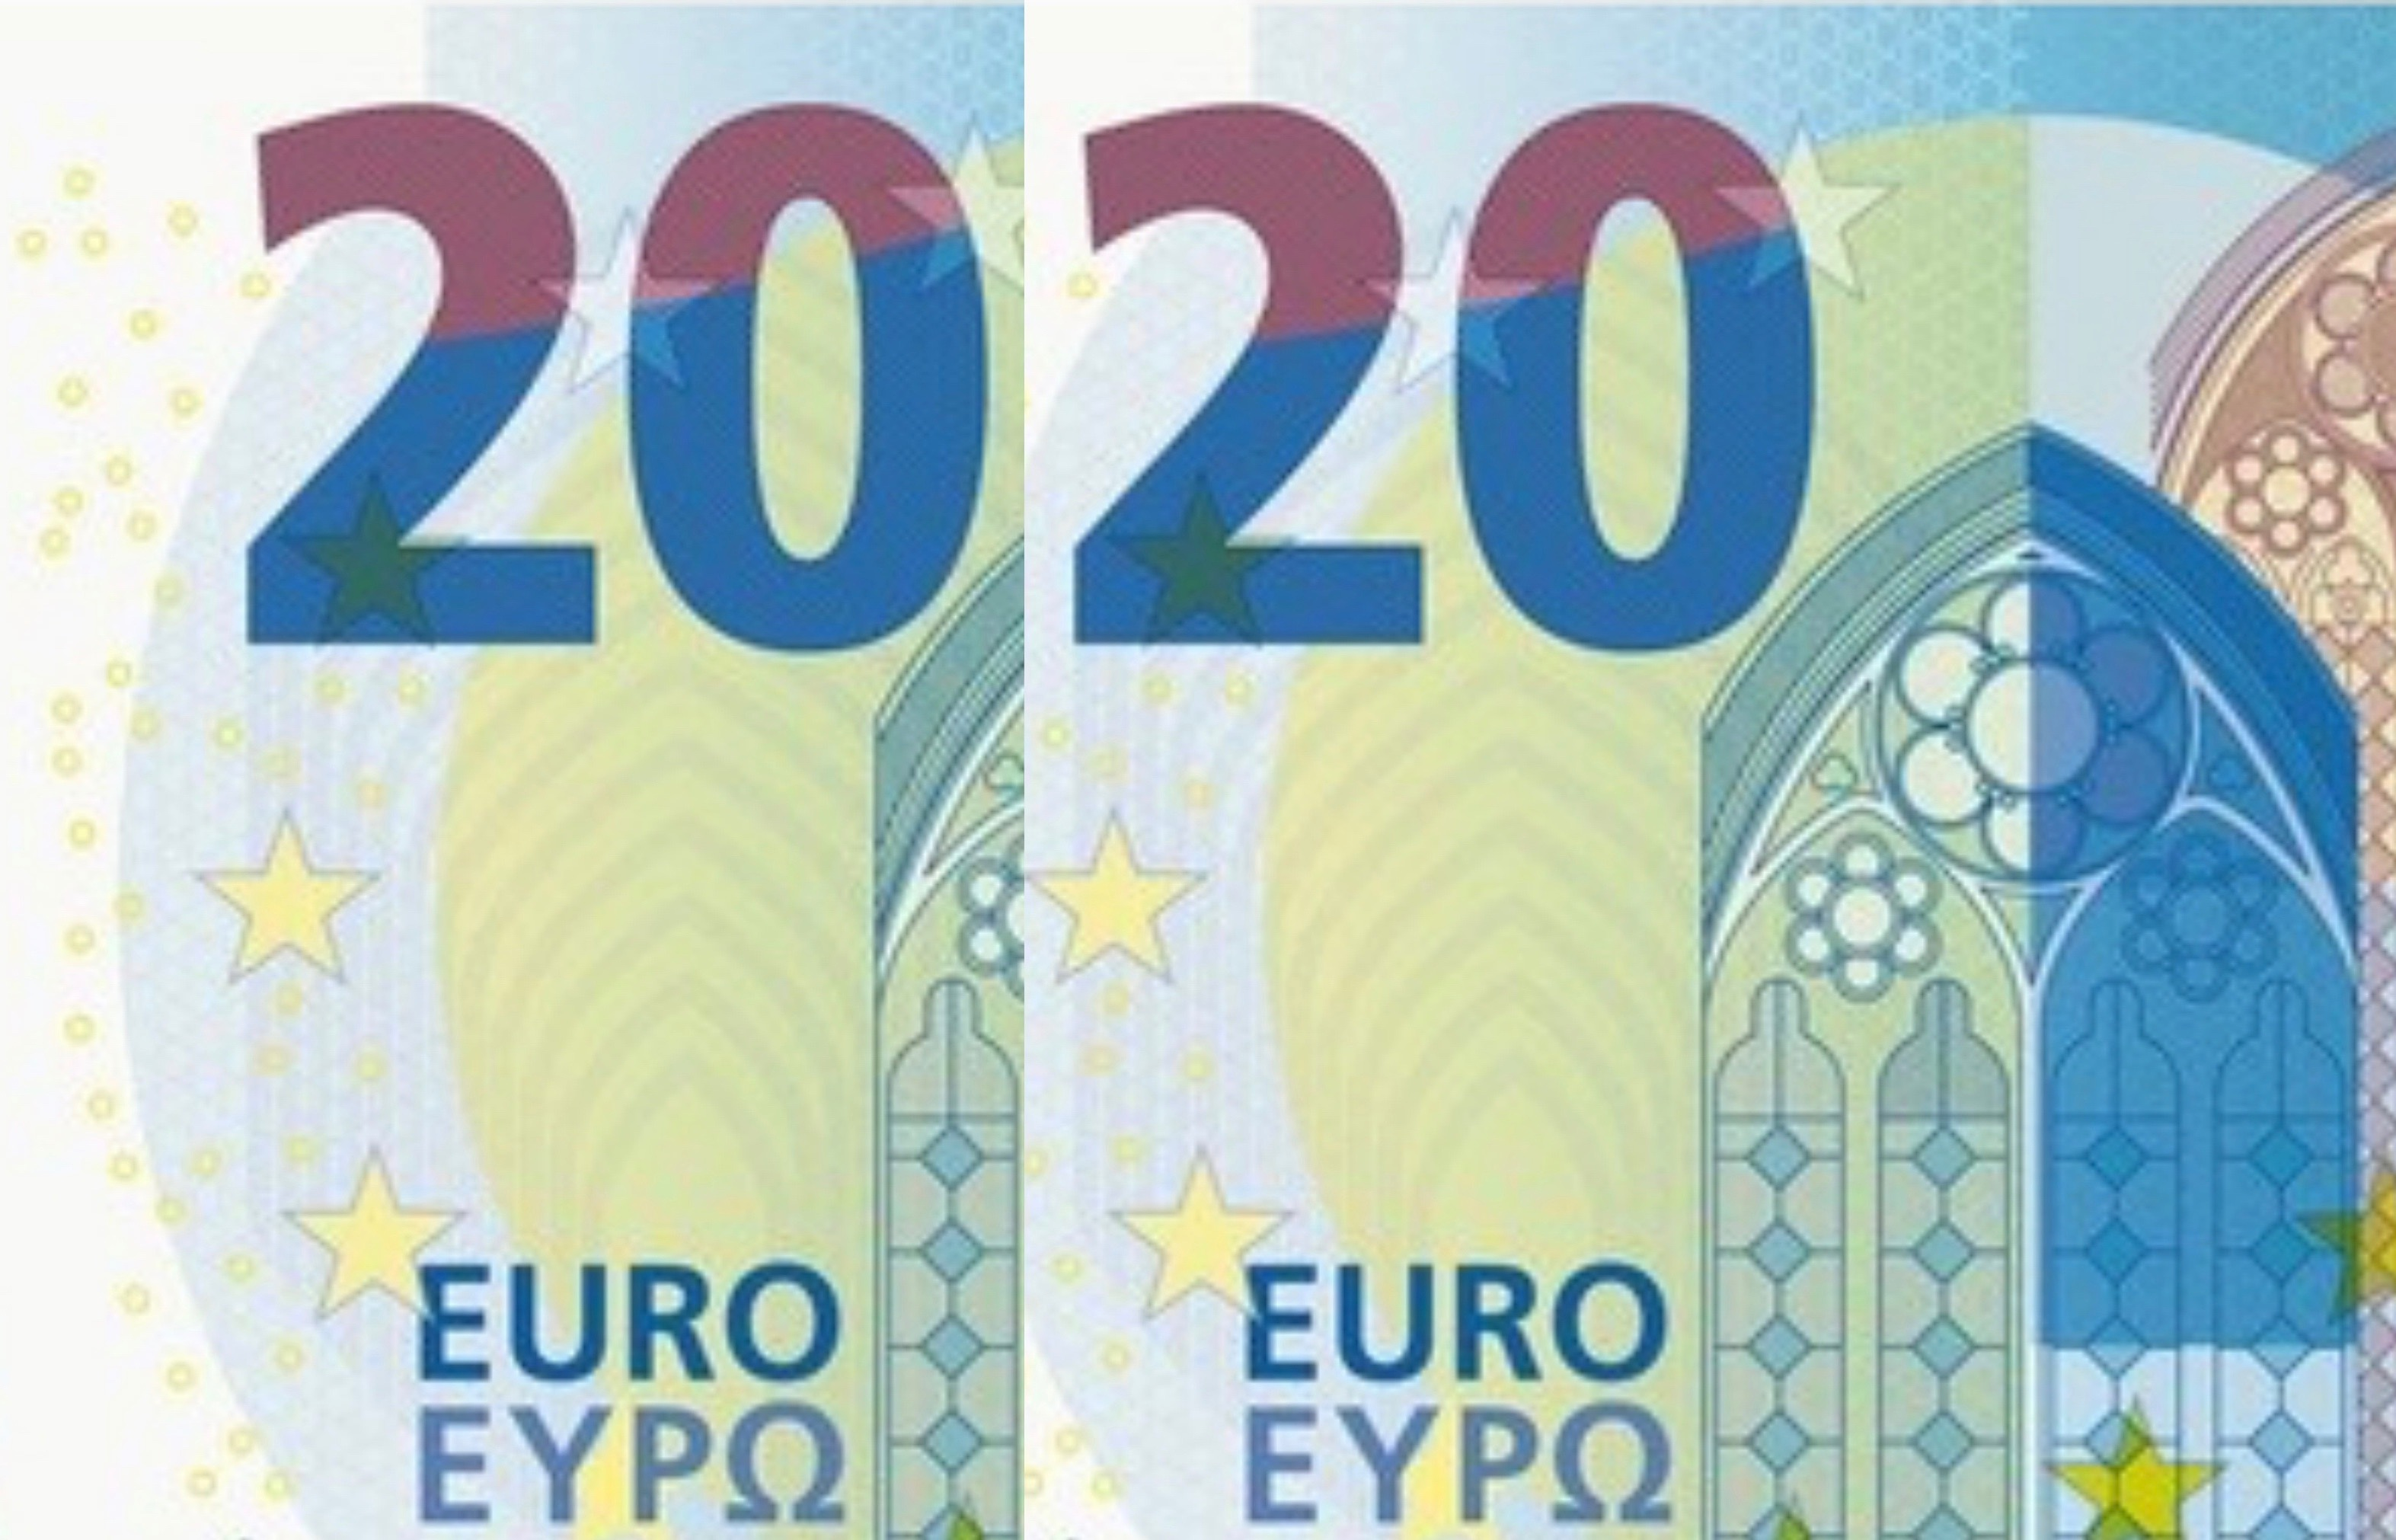 Budget 2020 Rixensart cdp